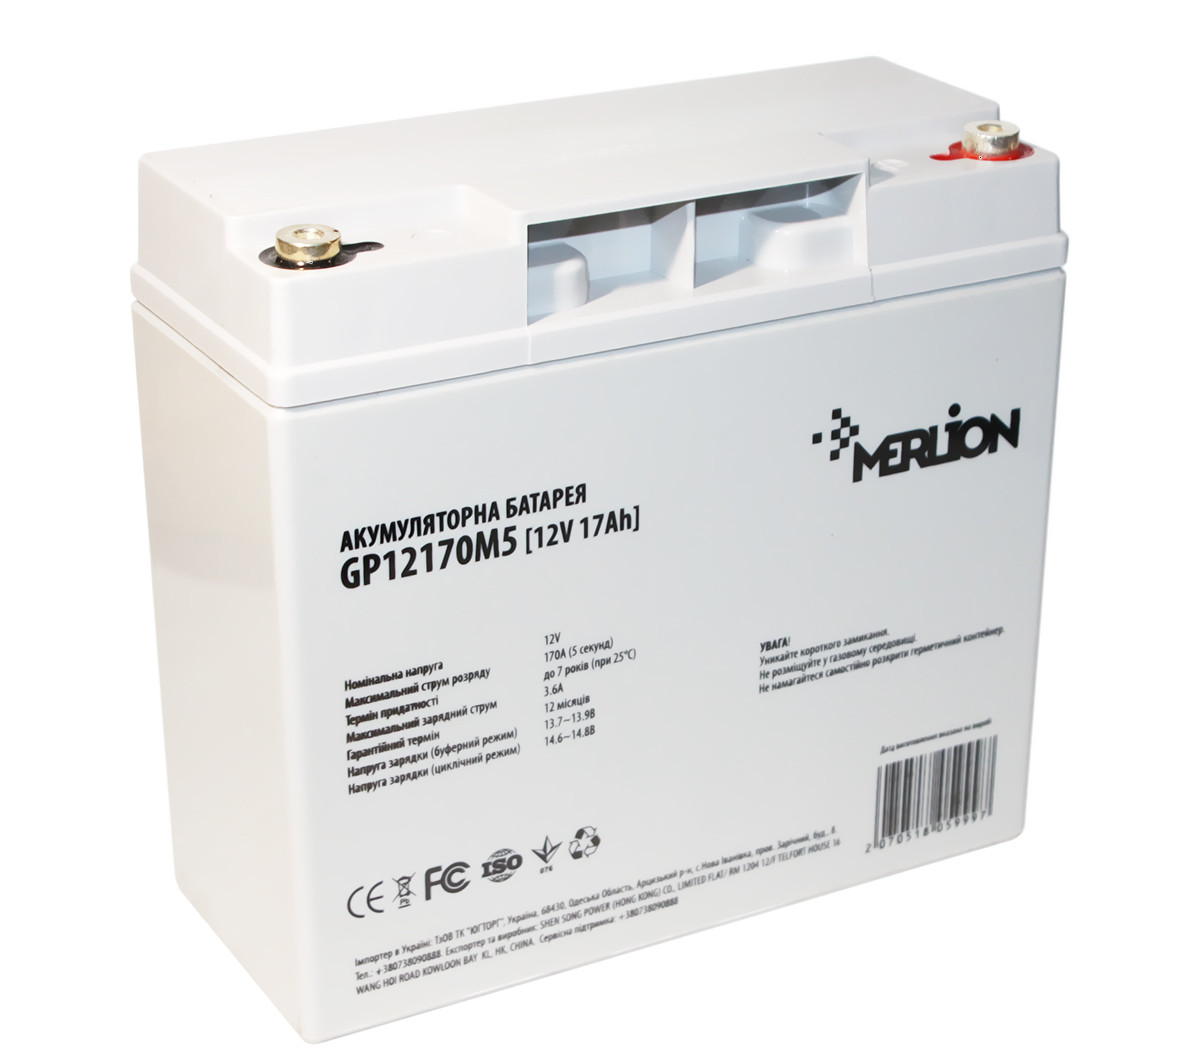 Аккумулятор для ИБП 12В 17Ач Merlion AGM GP12170M5, 12V 17.0Ah, 181х77х167 мм